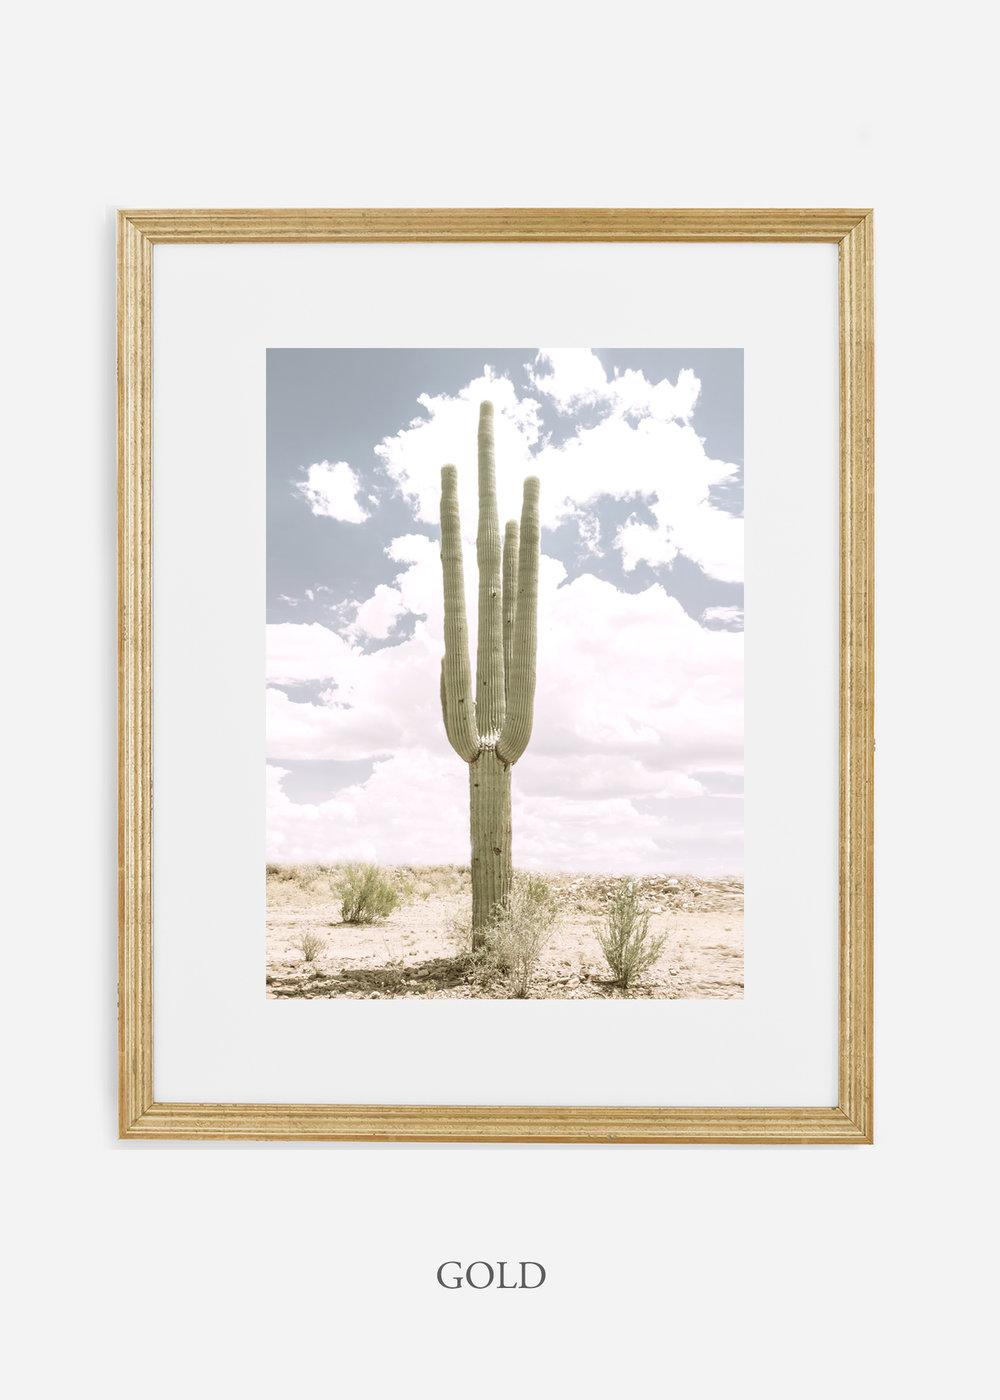 Desert_goldframe_SoloSaguaro_Southwest_Art_Photography_interiordesign_bohemian_cactusart.jpg